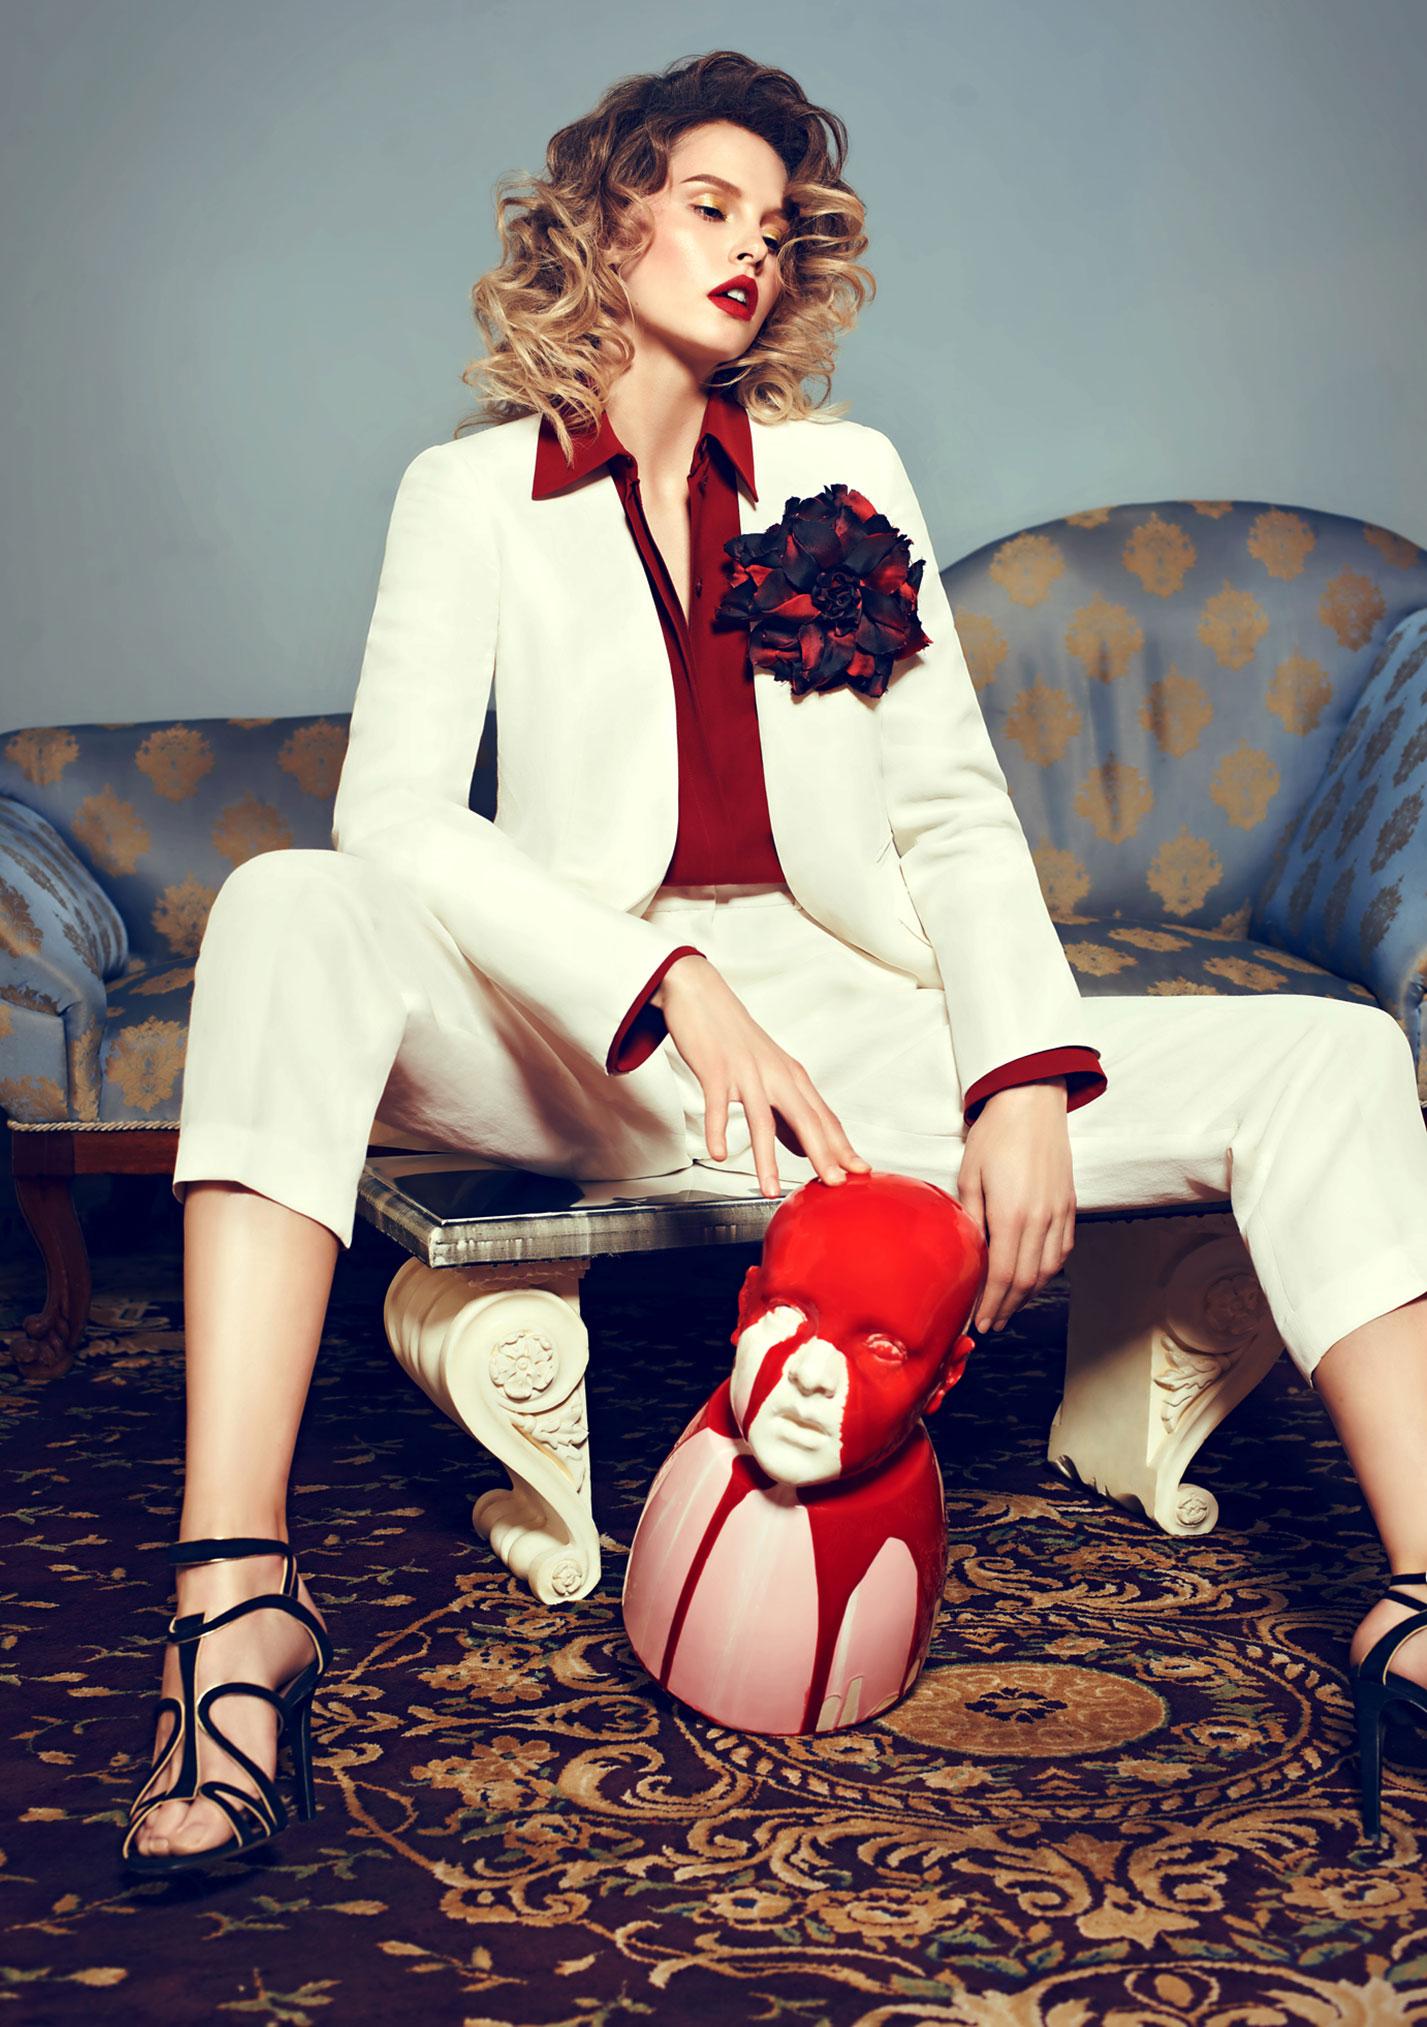 Антонина Ермолина в рекламной кампании модного бренда Au Pont Rouge, весна-лето 2017 / фото 07